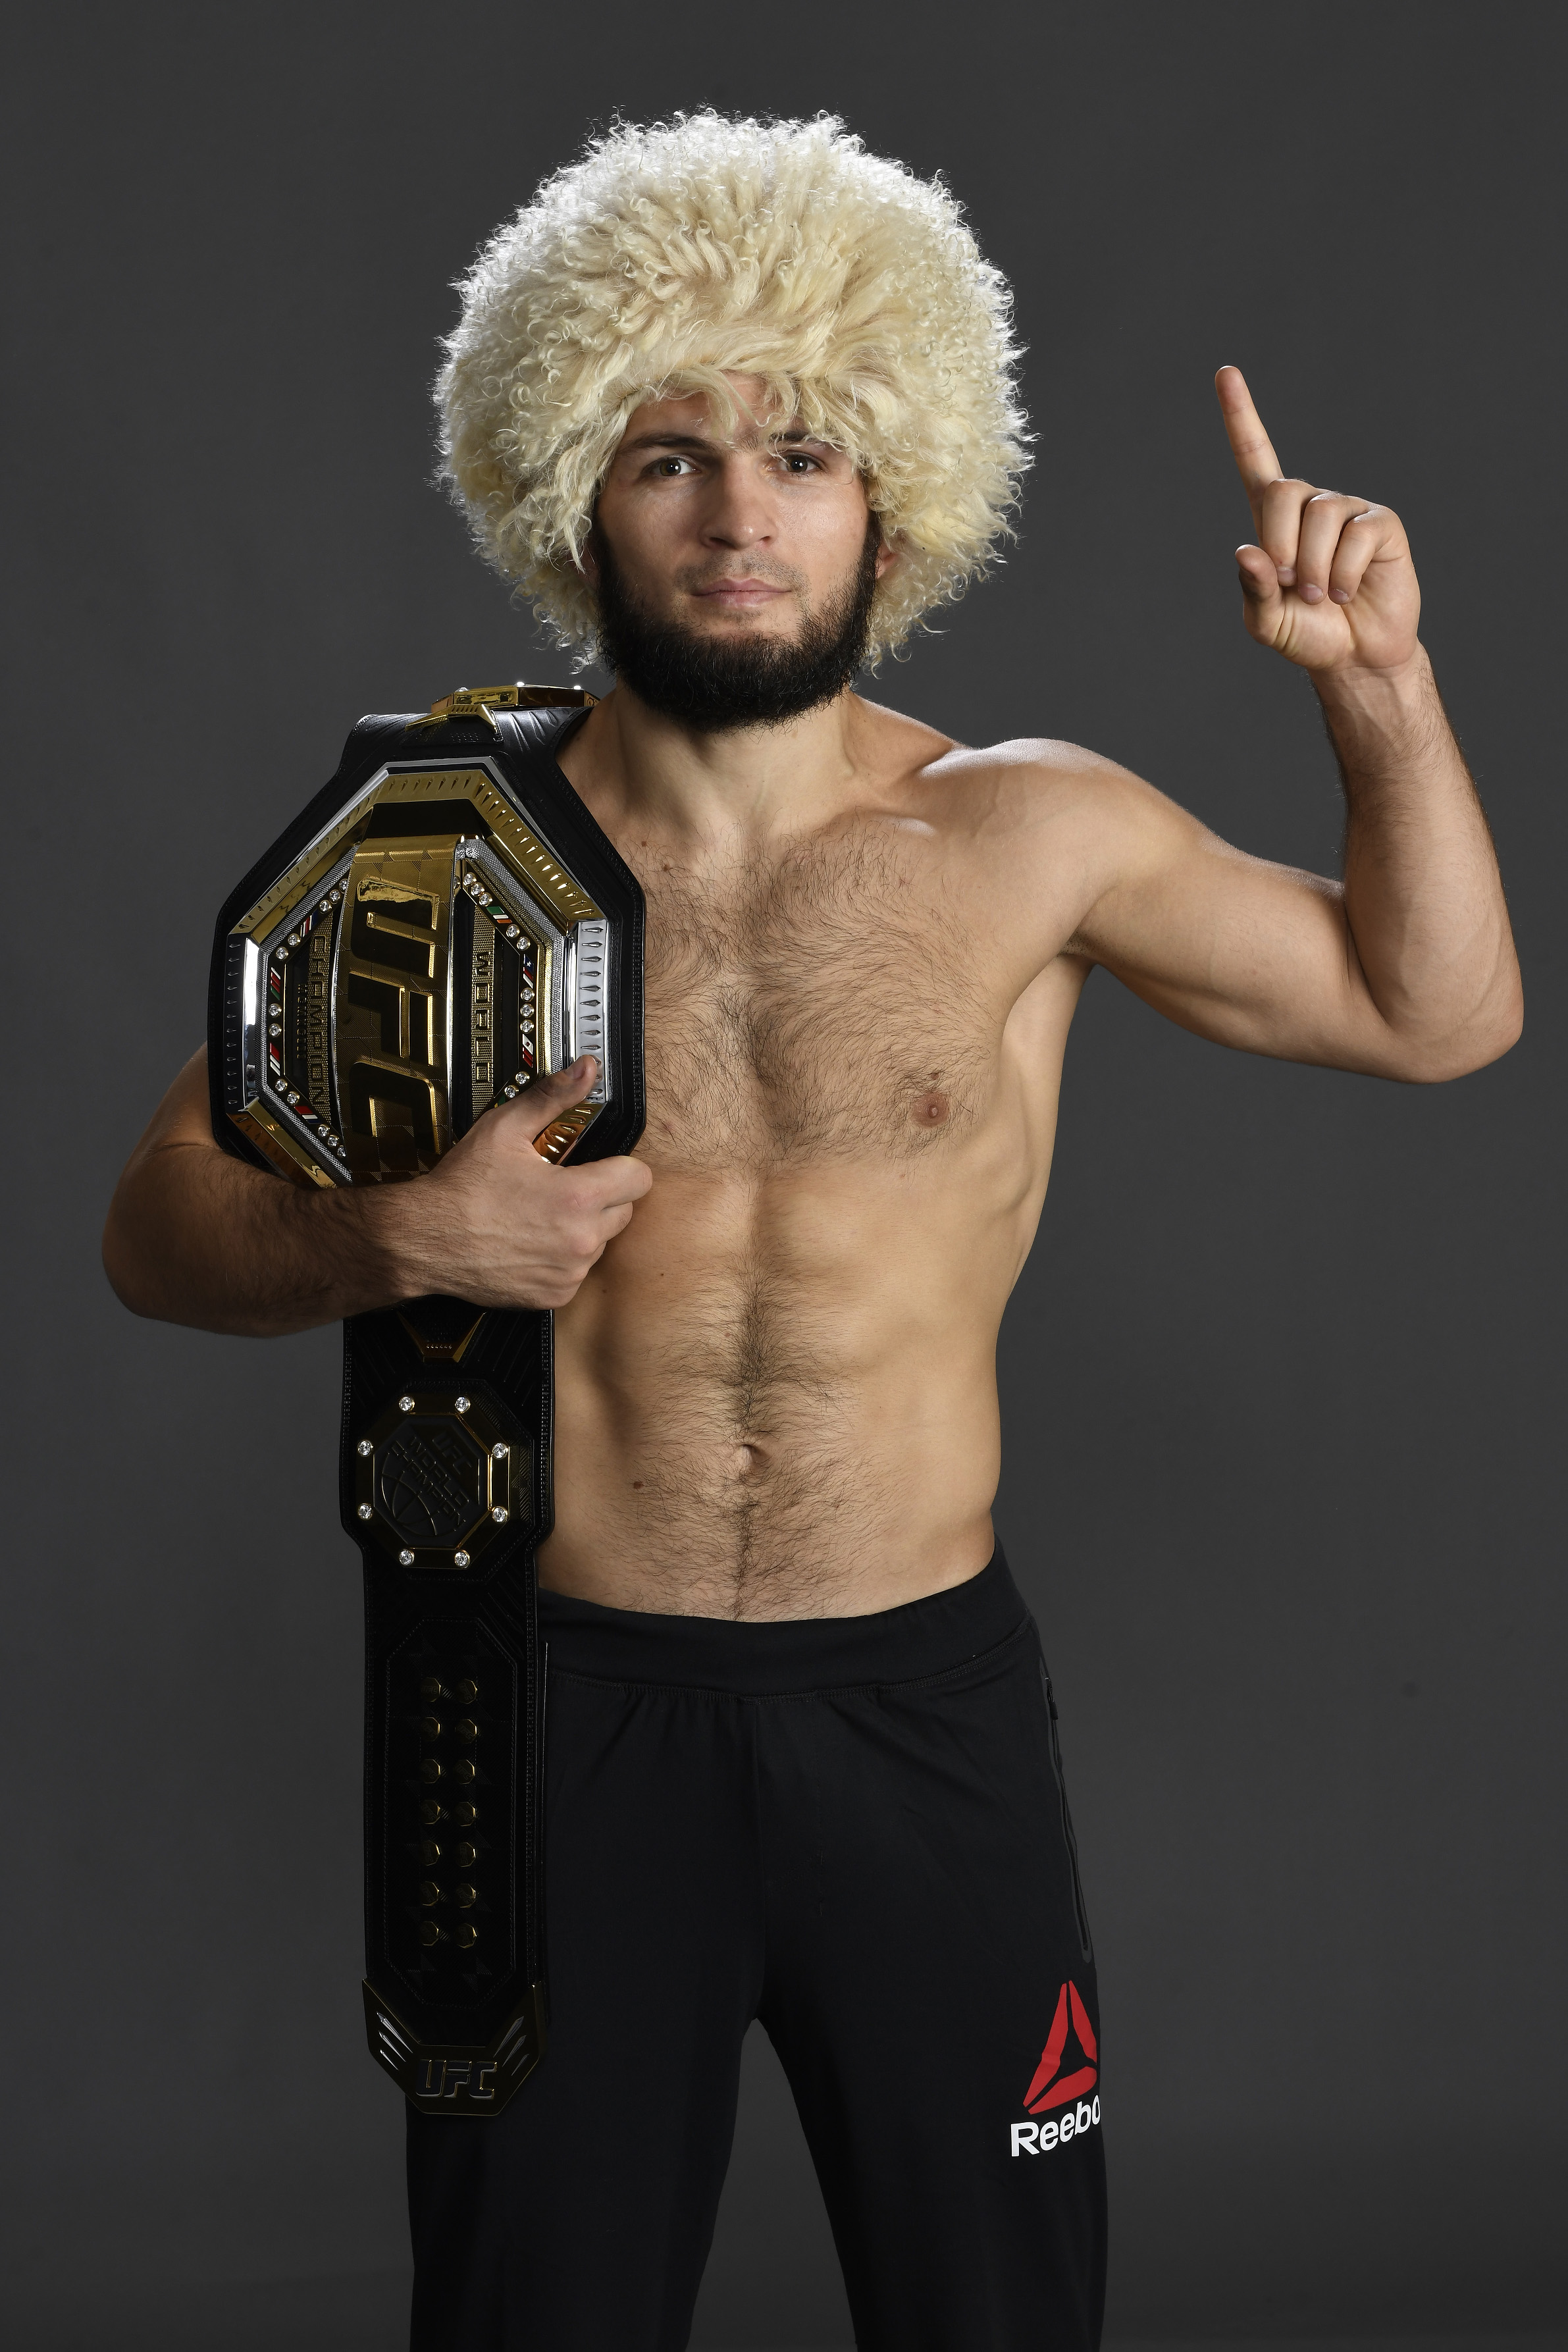 UFC 254: Khabib Nurmagomedov MMA news